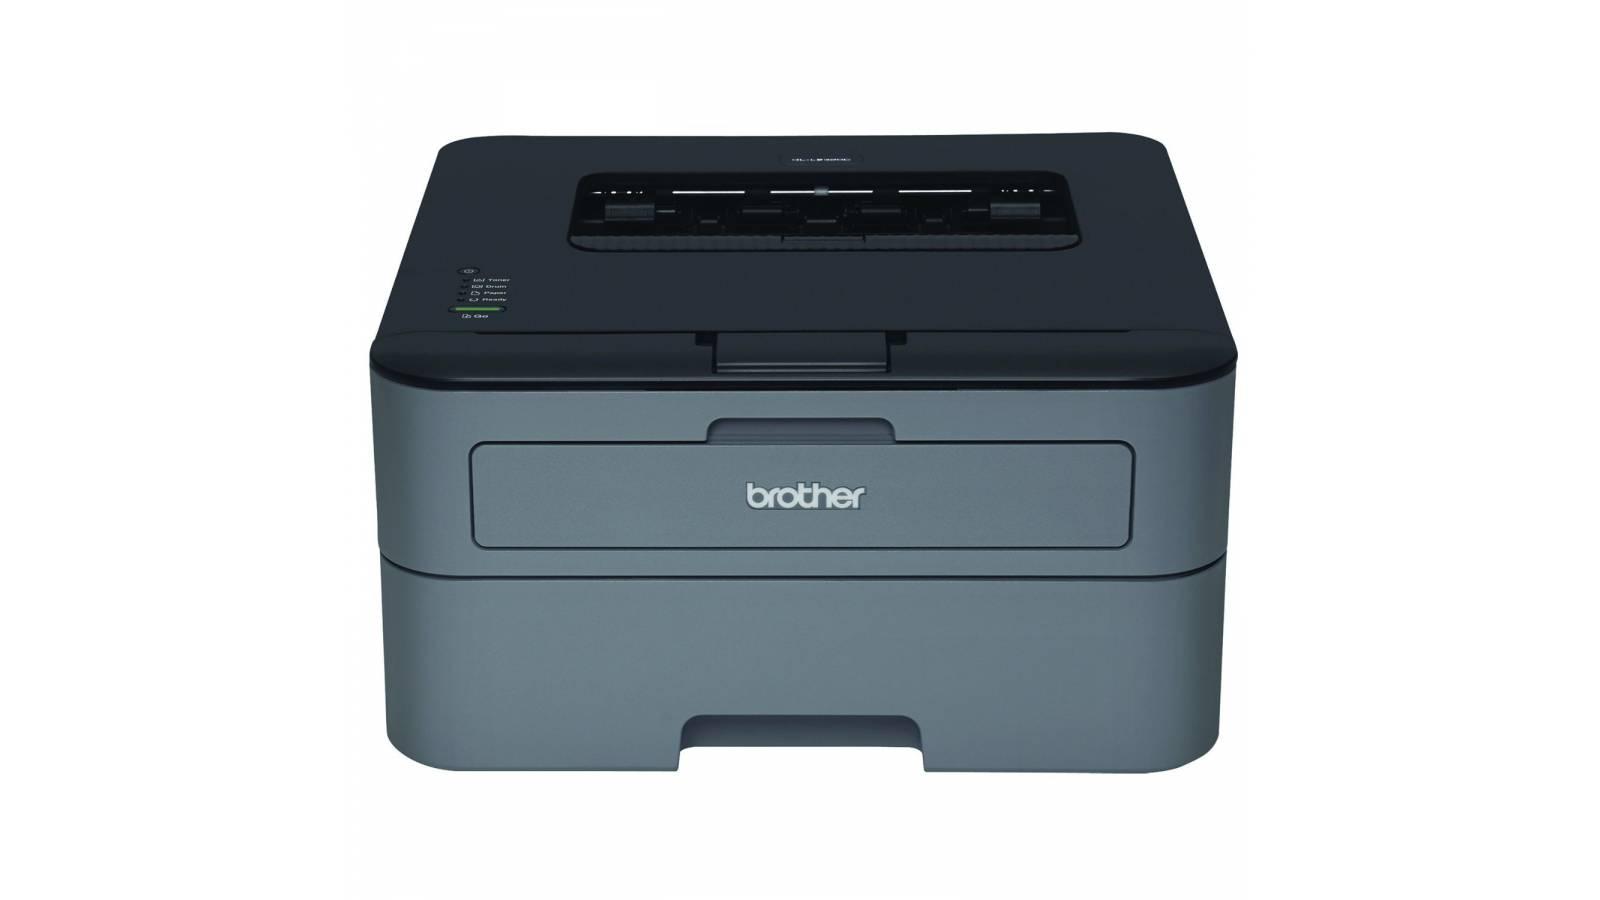 Nueva Impresora Brother HL-L2320D